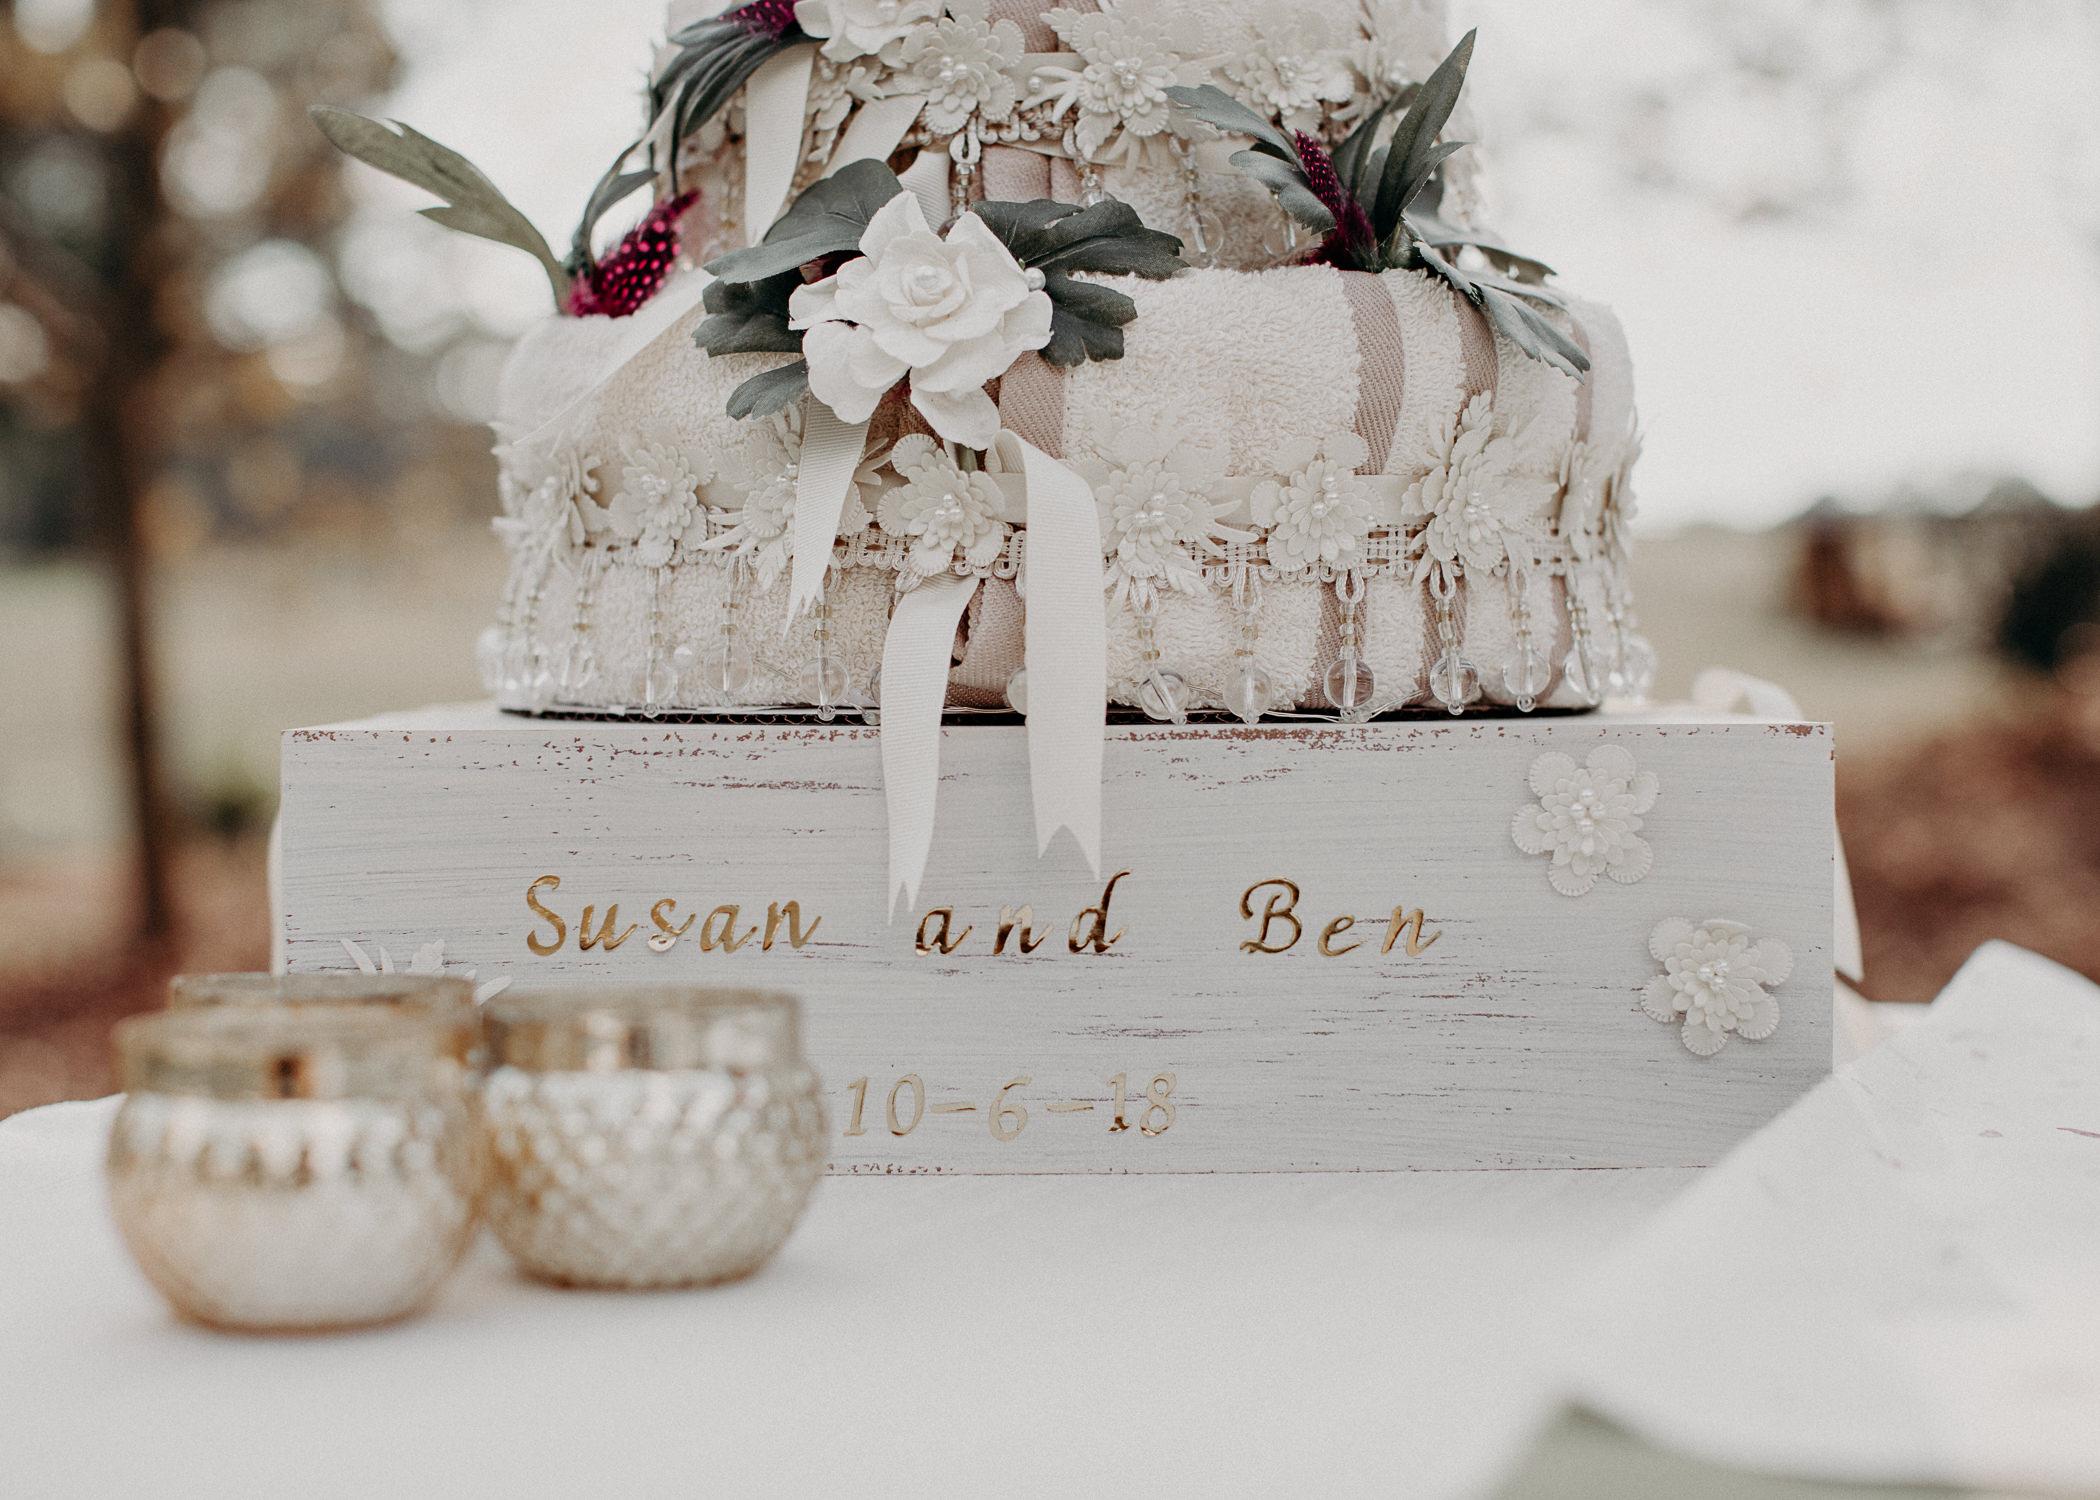 50 - details, cake, flowers, wedding dress, bridesmaids, bouquet - bride getting ready wedding seranbi farms atlanta .jpg